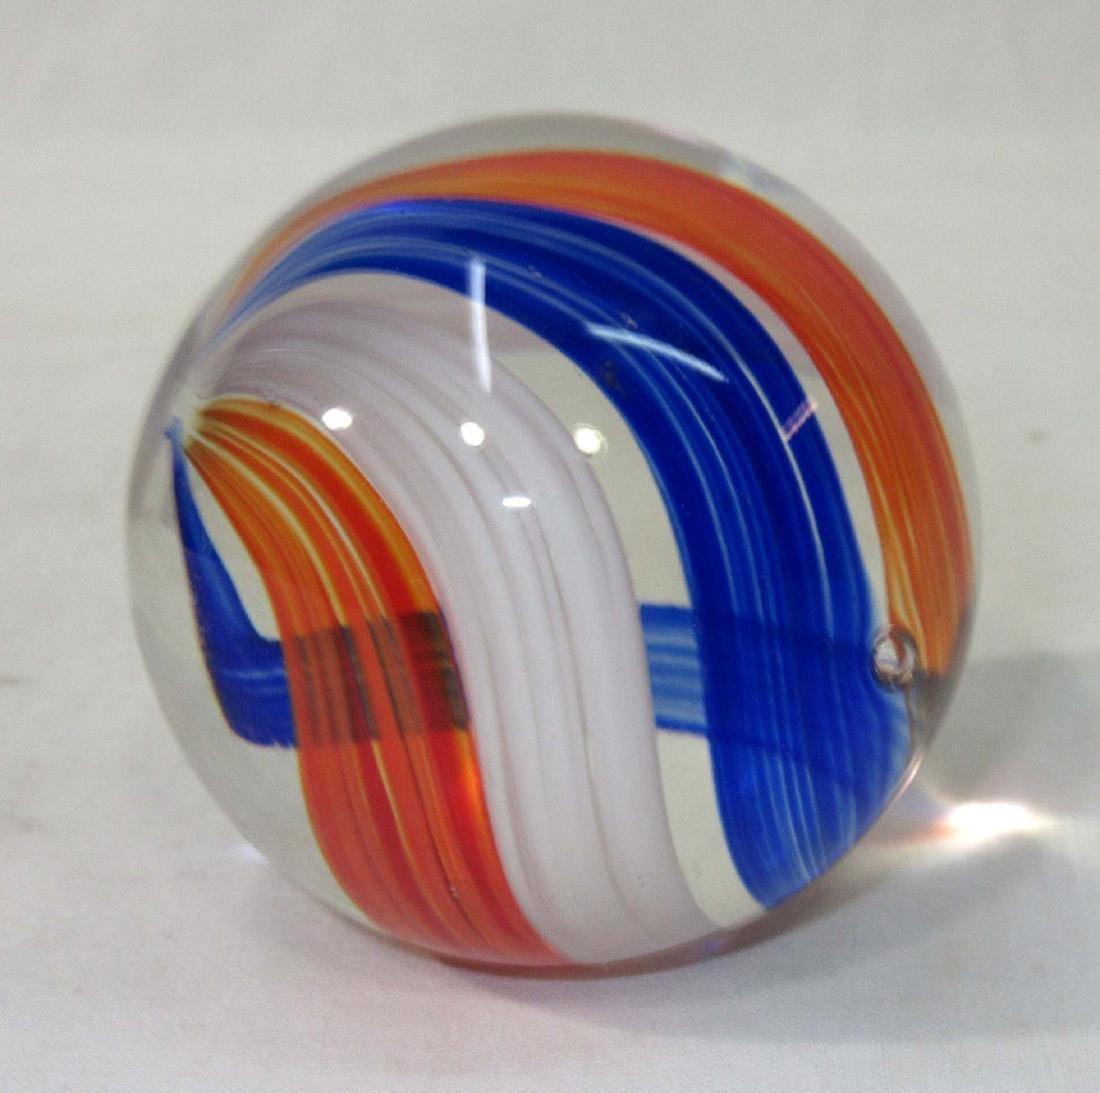 "2 1/2"" Swirl Marble"